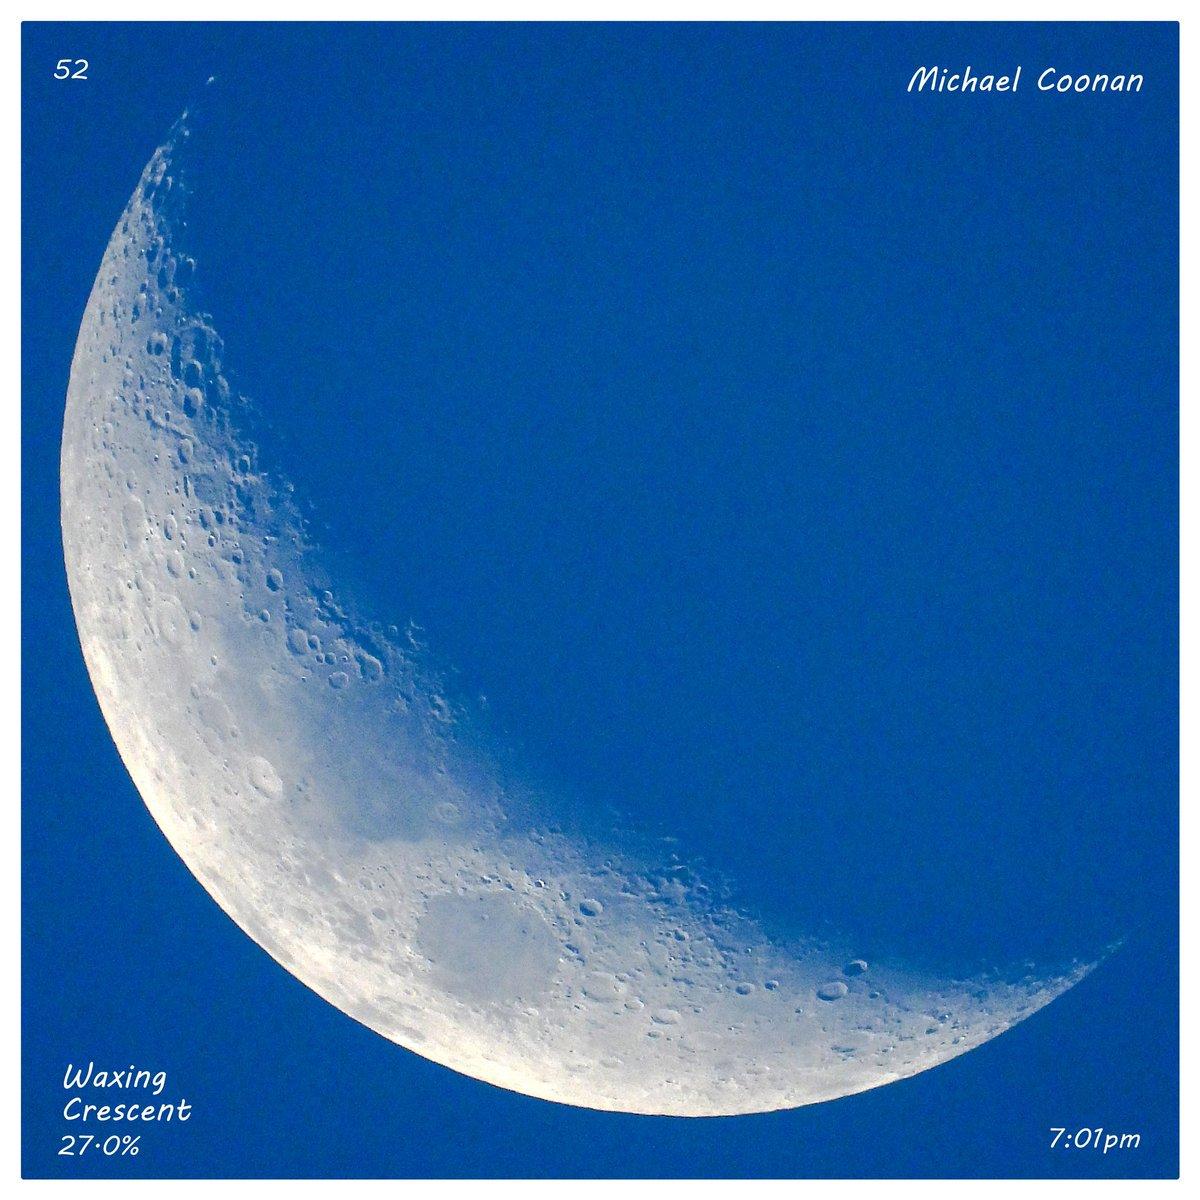 Wednesday October 21st Waxing Crescent Moon 27.0% in Wodonga Australia #StormHour #moon #luna #moonshot #Moon_awards #astrophotography #astronomy @CherScheff @KayMcCaffery1 @PicPublic @PicPoet #500pxrtg @ThePhotoHour @BonfirePictures @500pxrtg https://t.co/bQyhT4N0JB